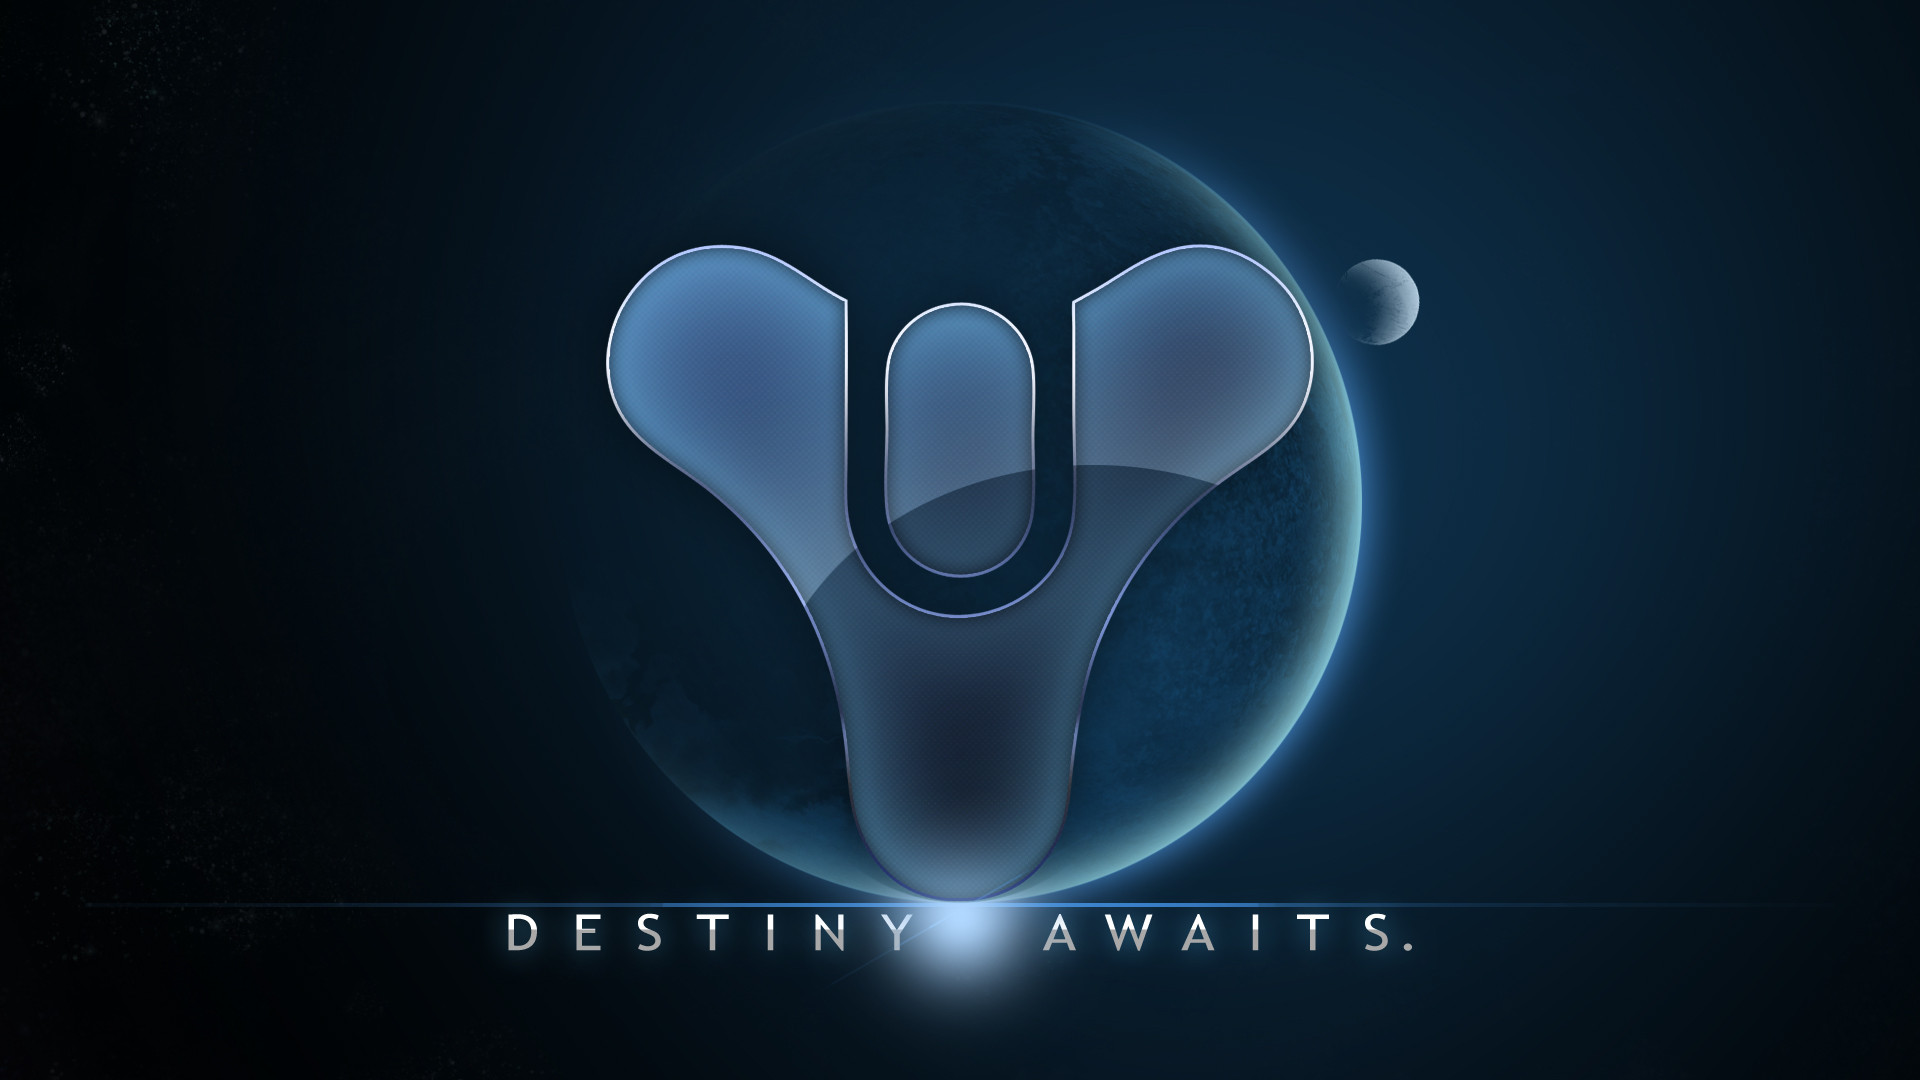 logo destiny wallpaper hd pixelstalk net